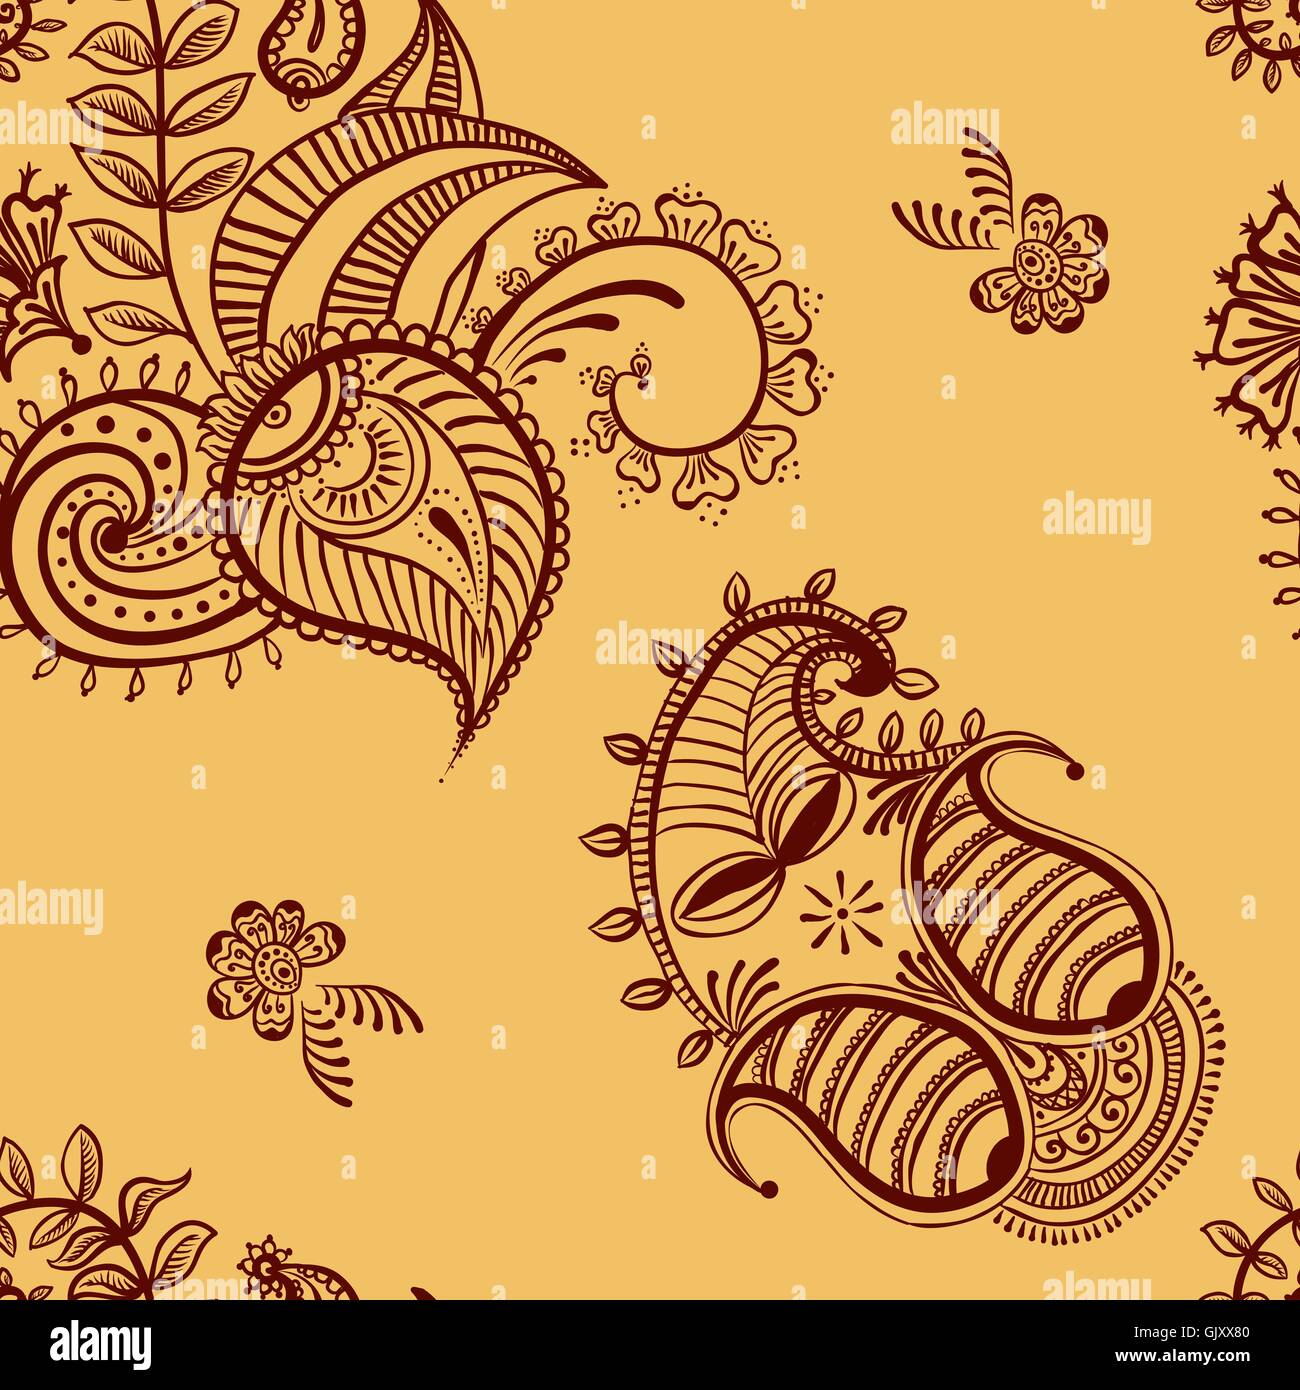 76 Gambar Ornamen Flora Paling Keren